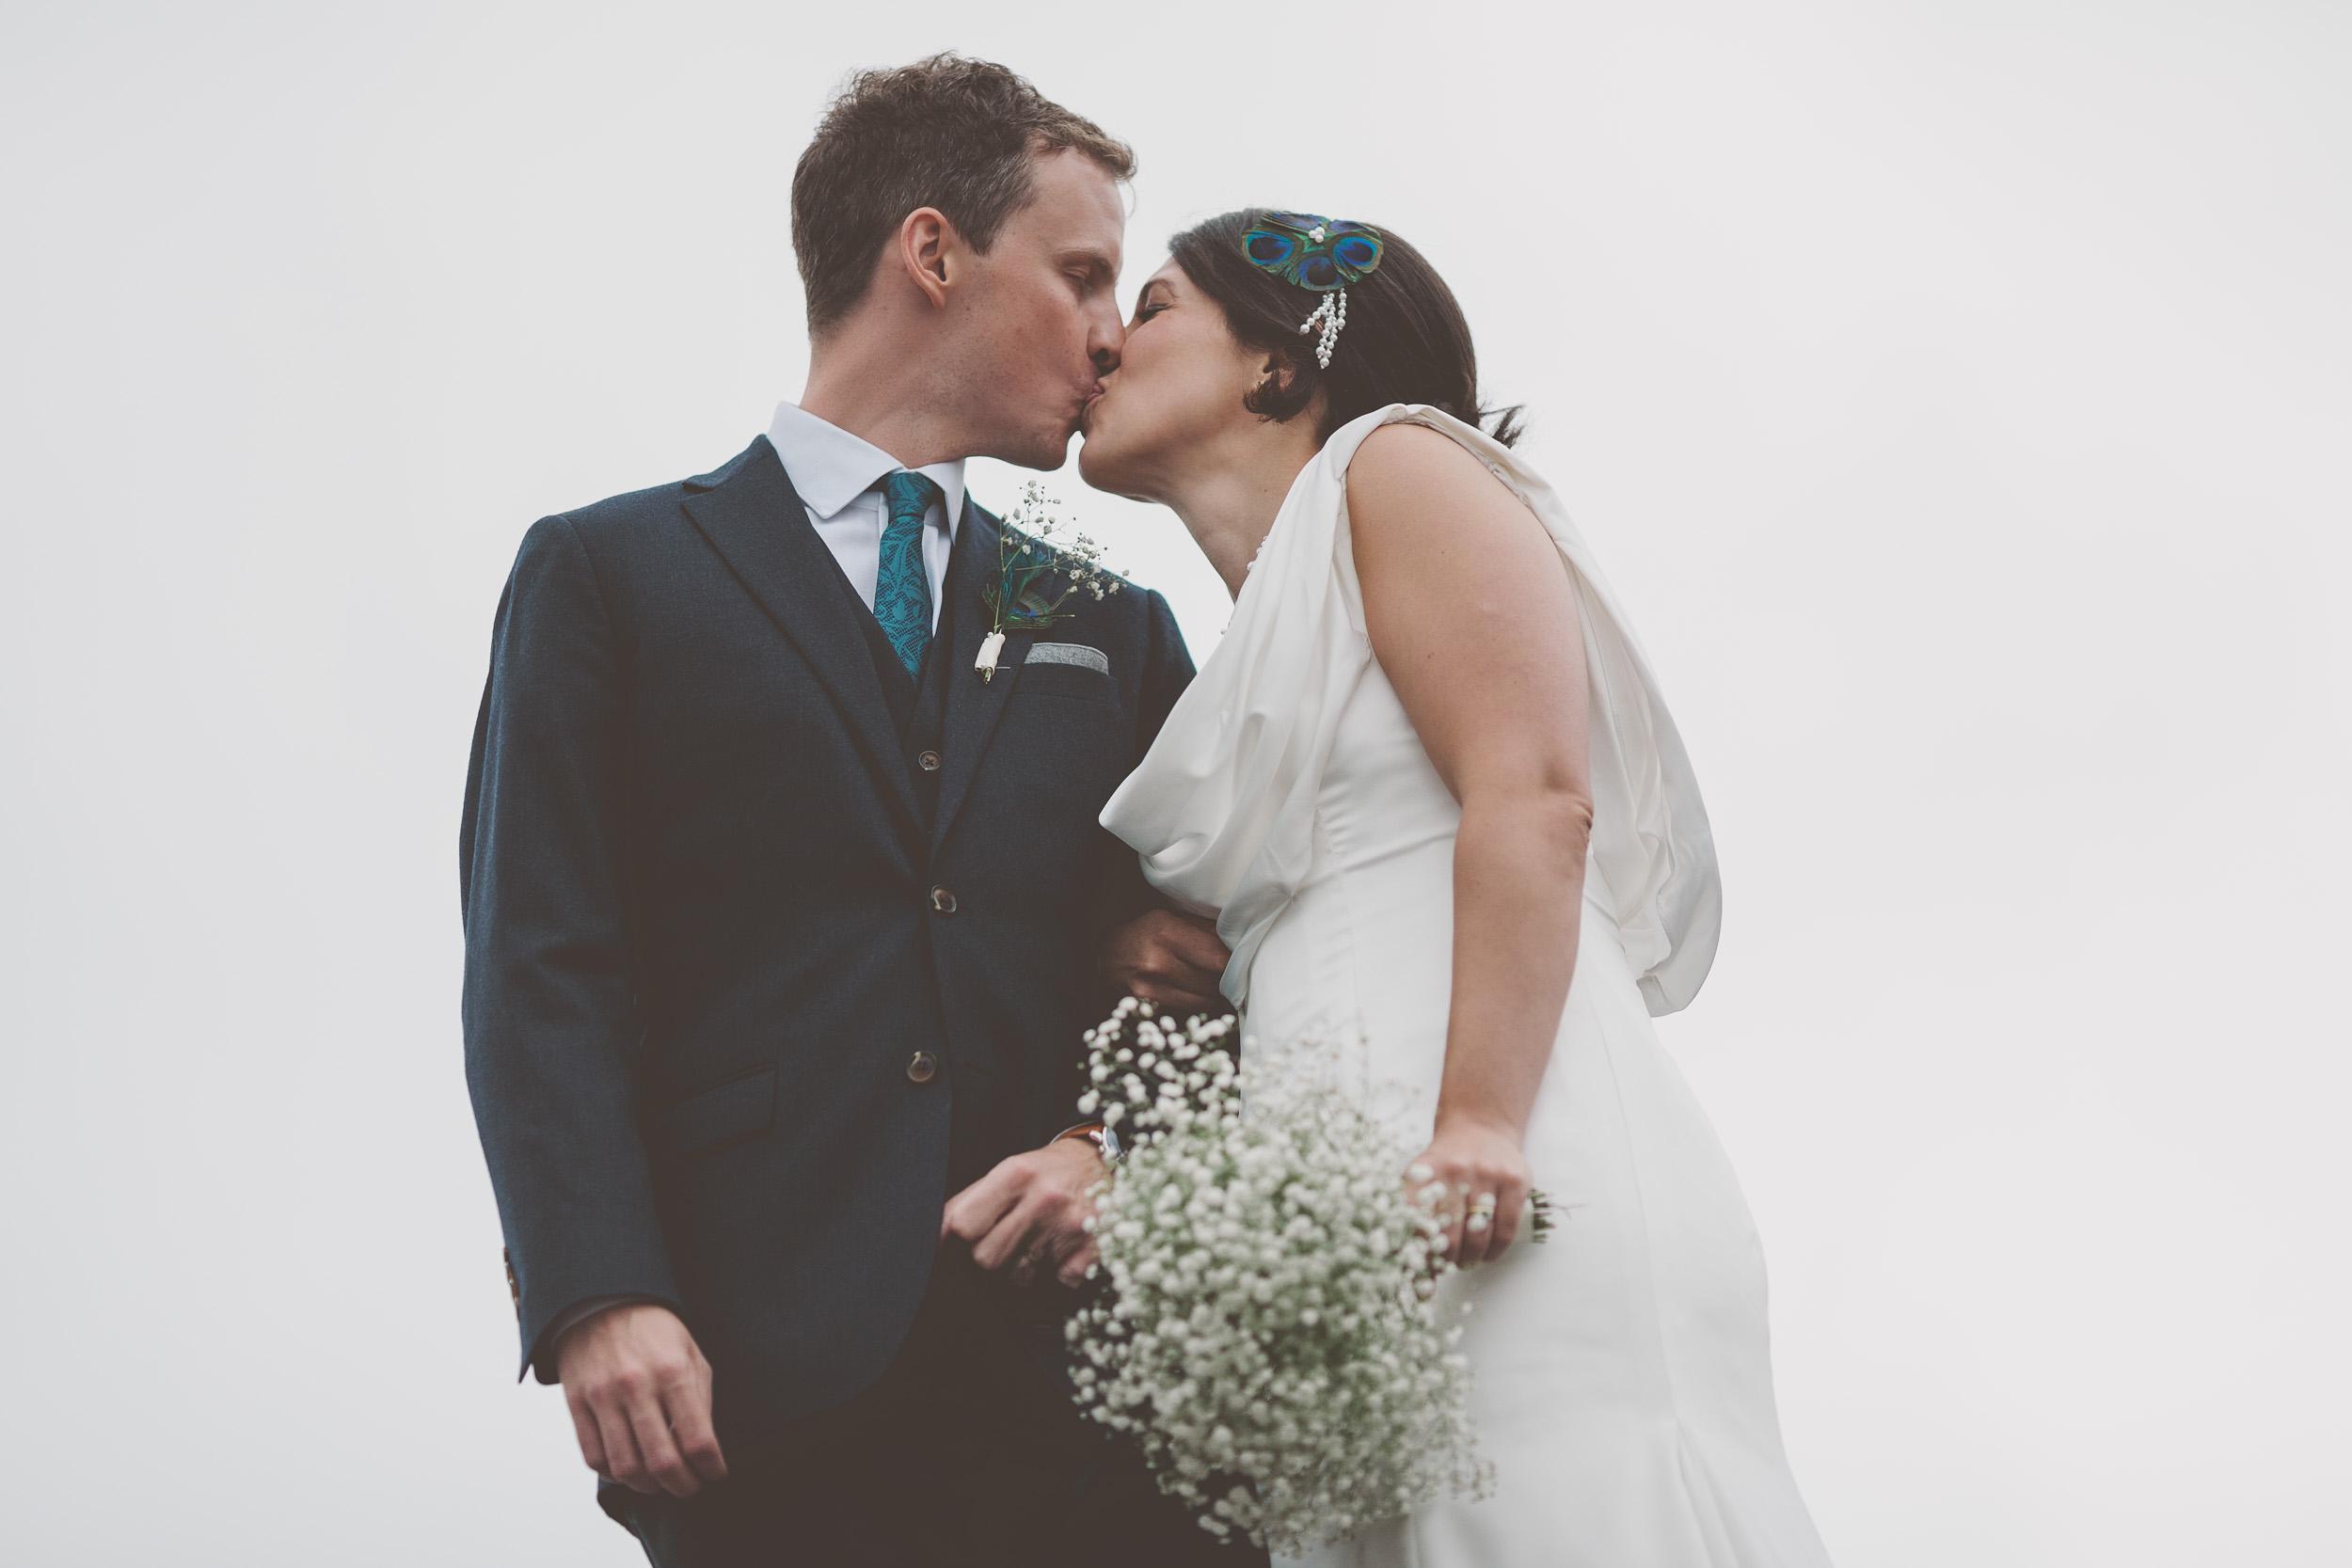 islington-town-hall-4th-floor-studios-wedding251.jpg